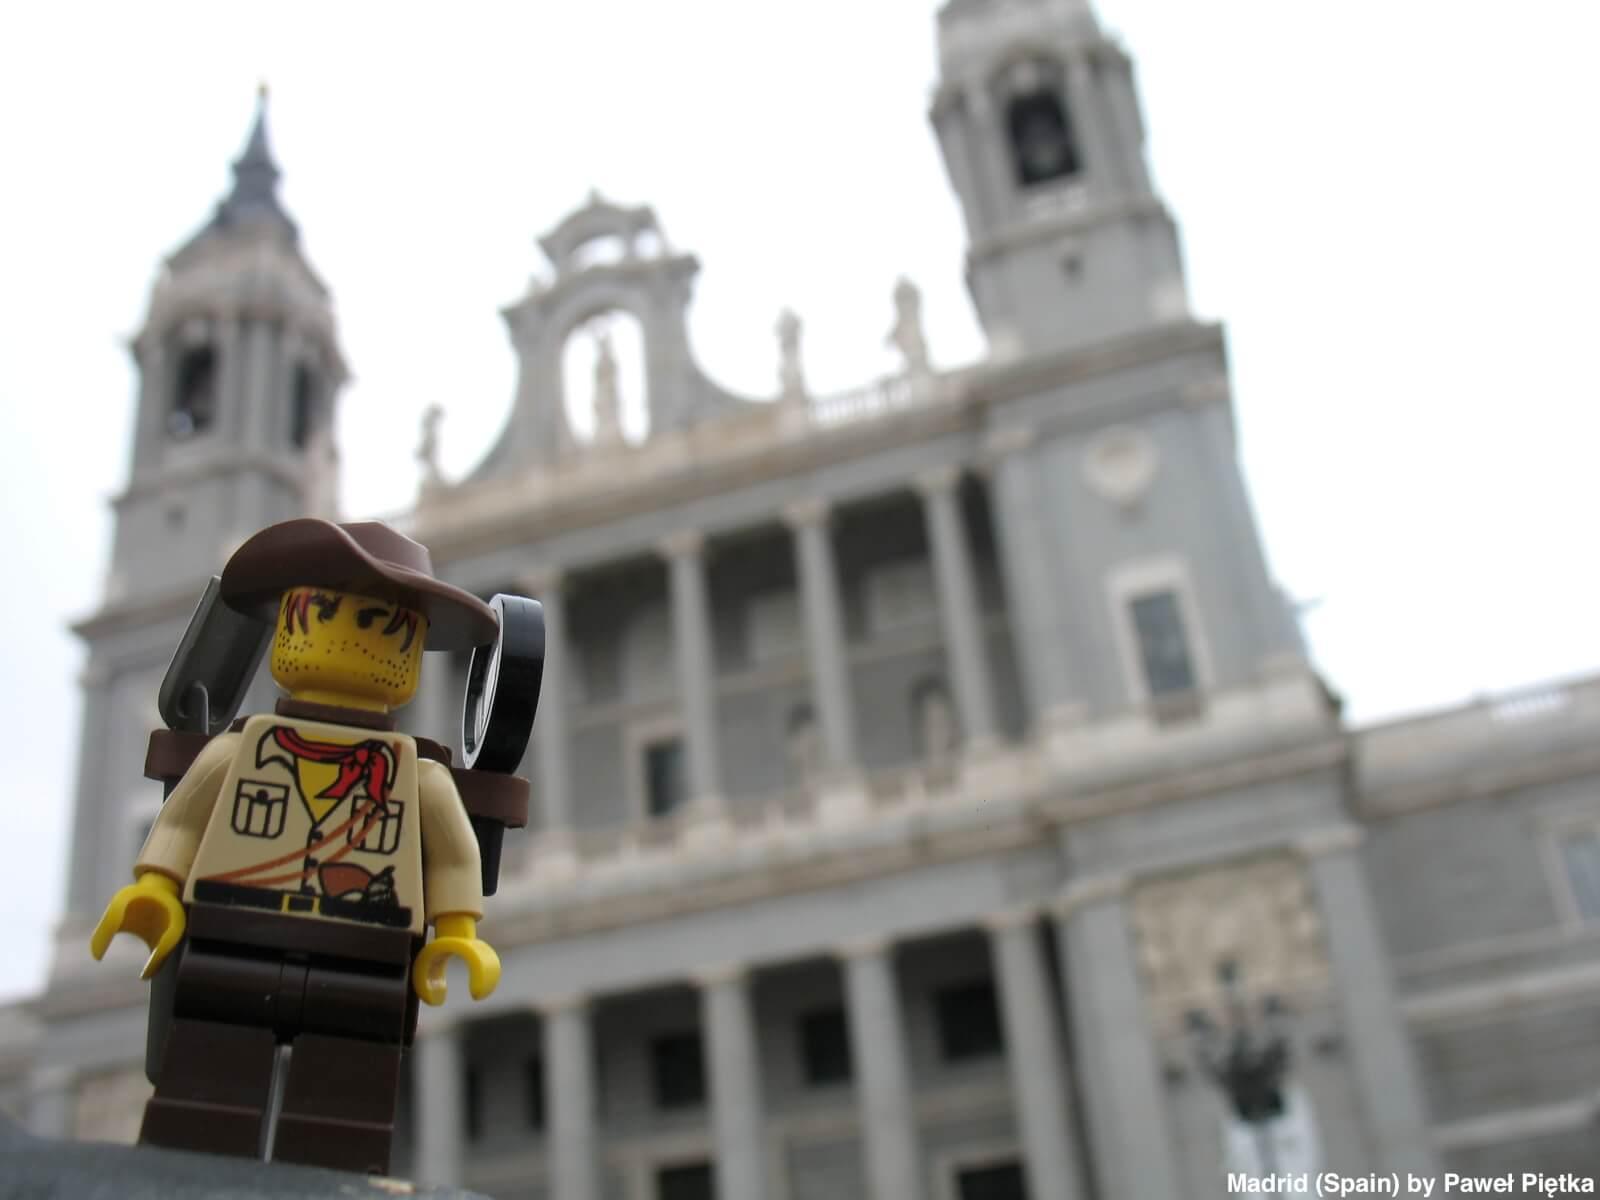 Madrid (Spain) - Almudena Cathedral